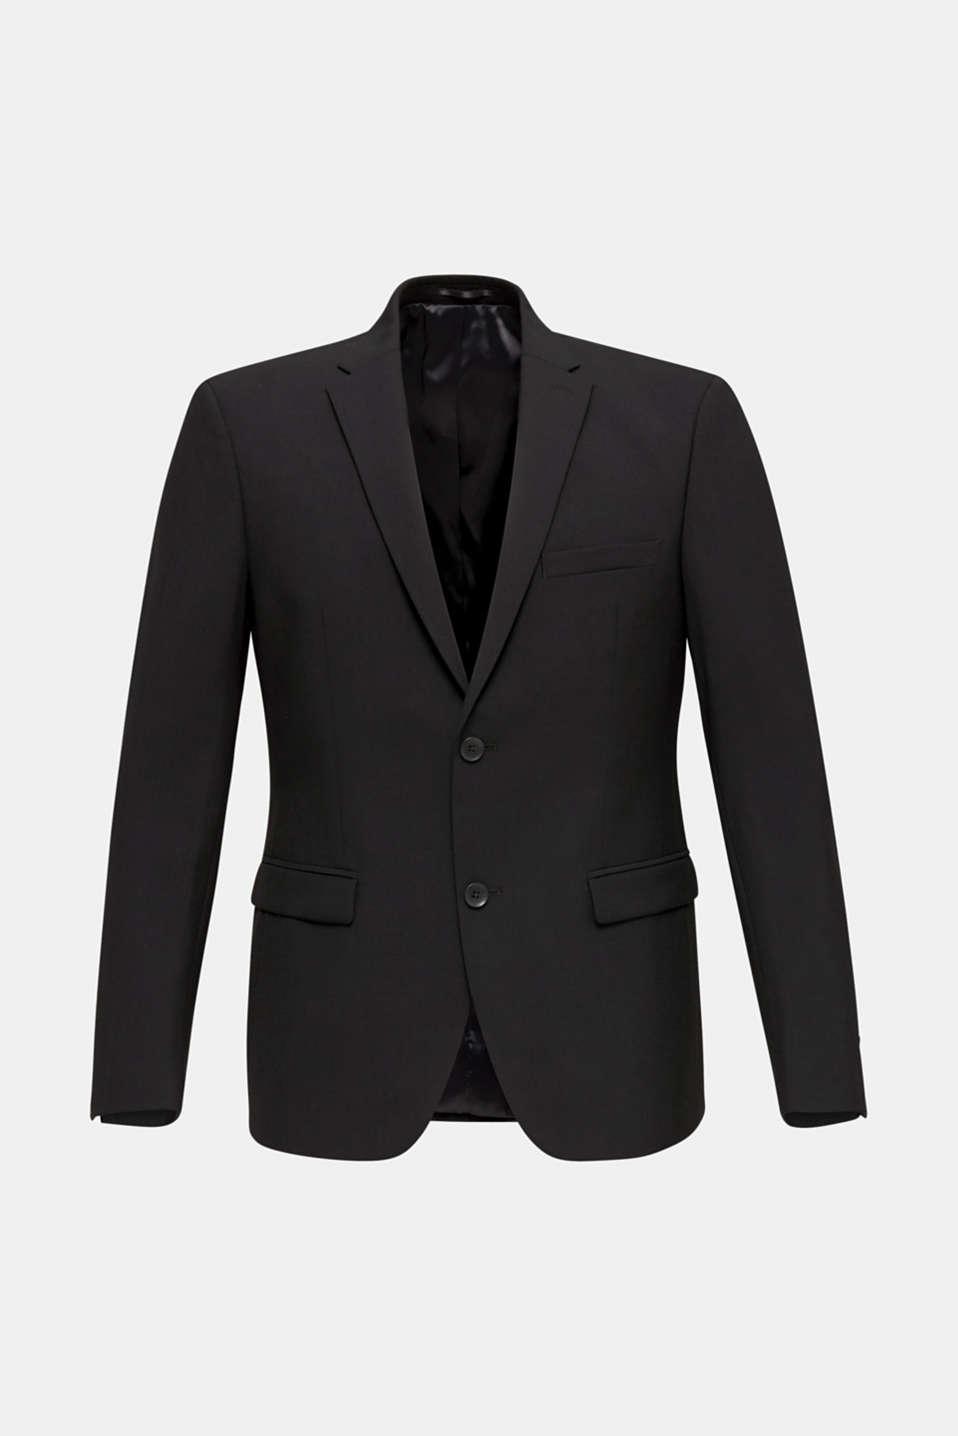 ACTIVE SUIT tailored jacket, wool blend, BLACK, detail image number 7